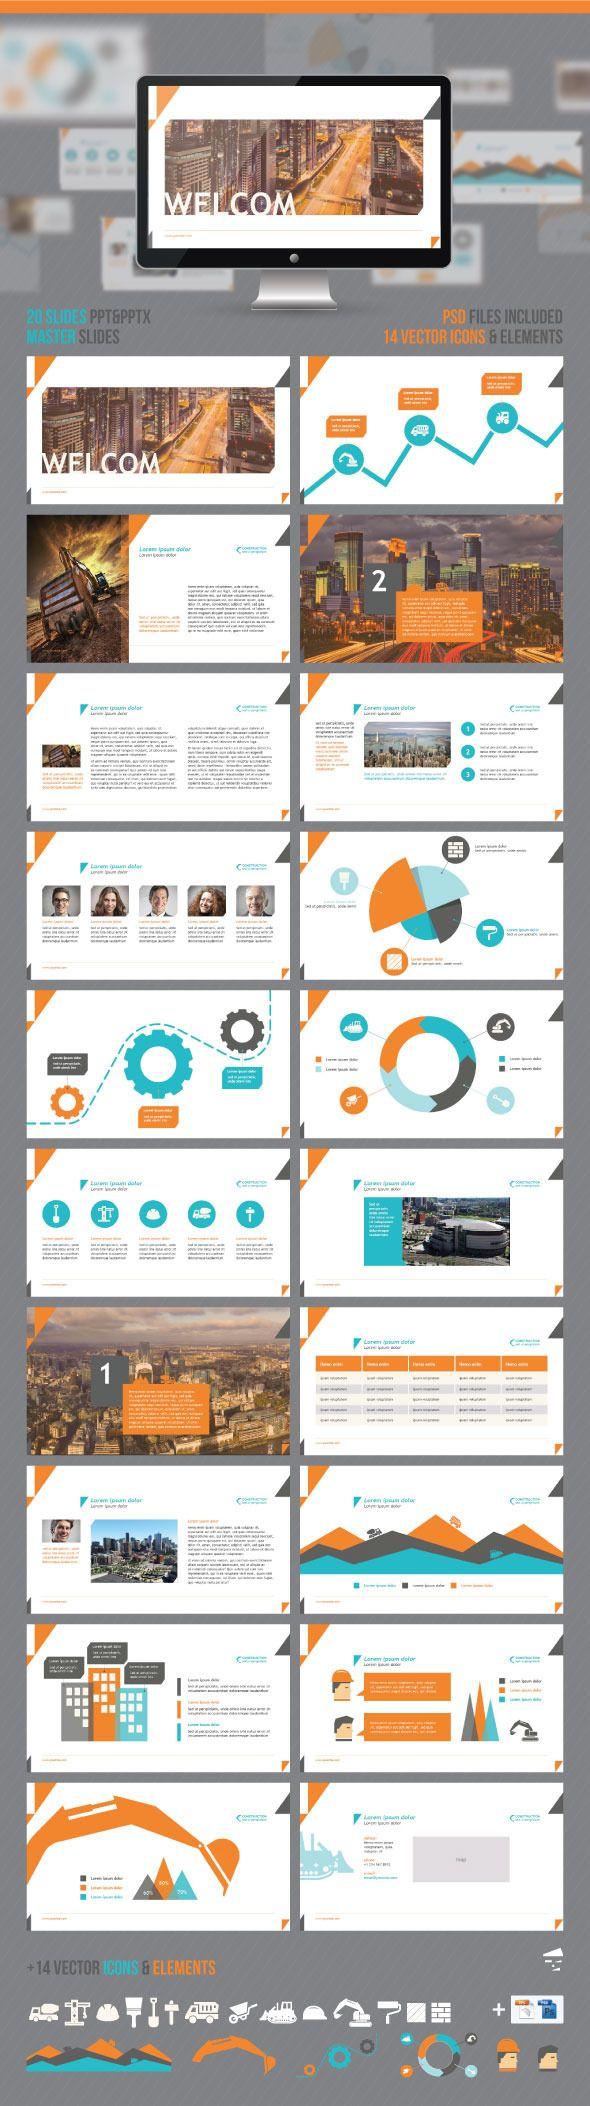 Construction Powerpoint Presentation Business Powerpoint Templates